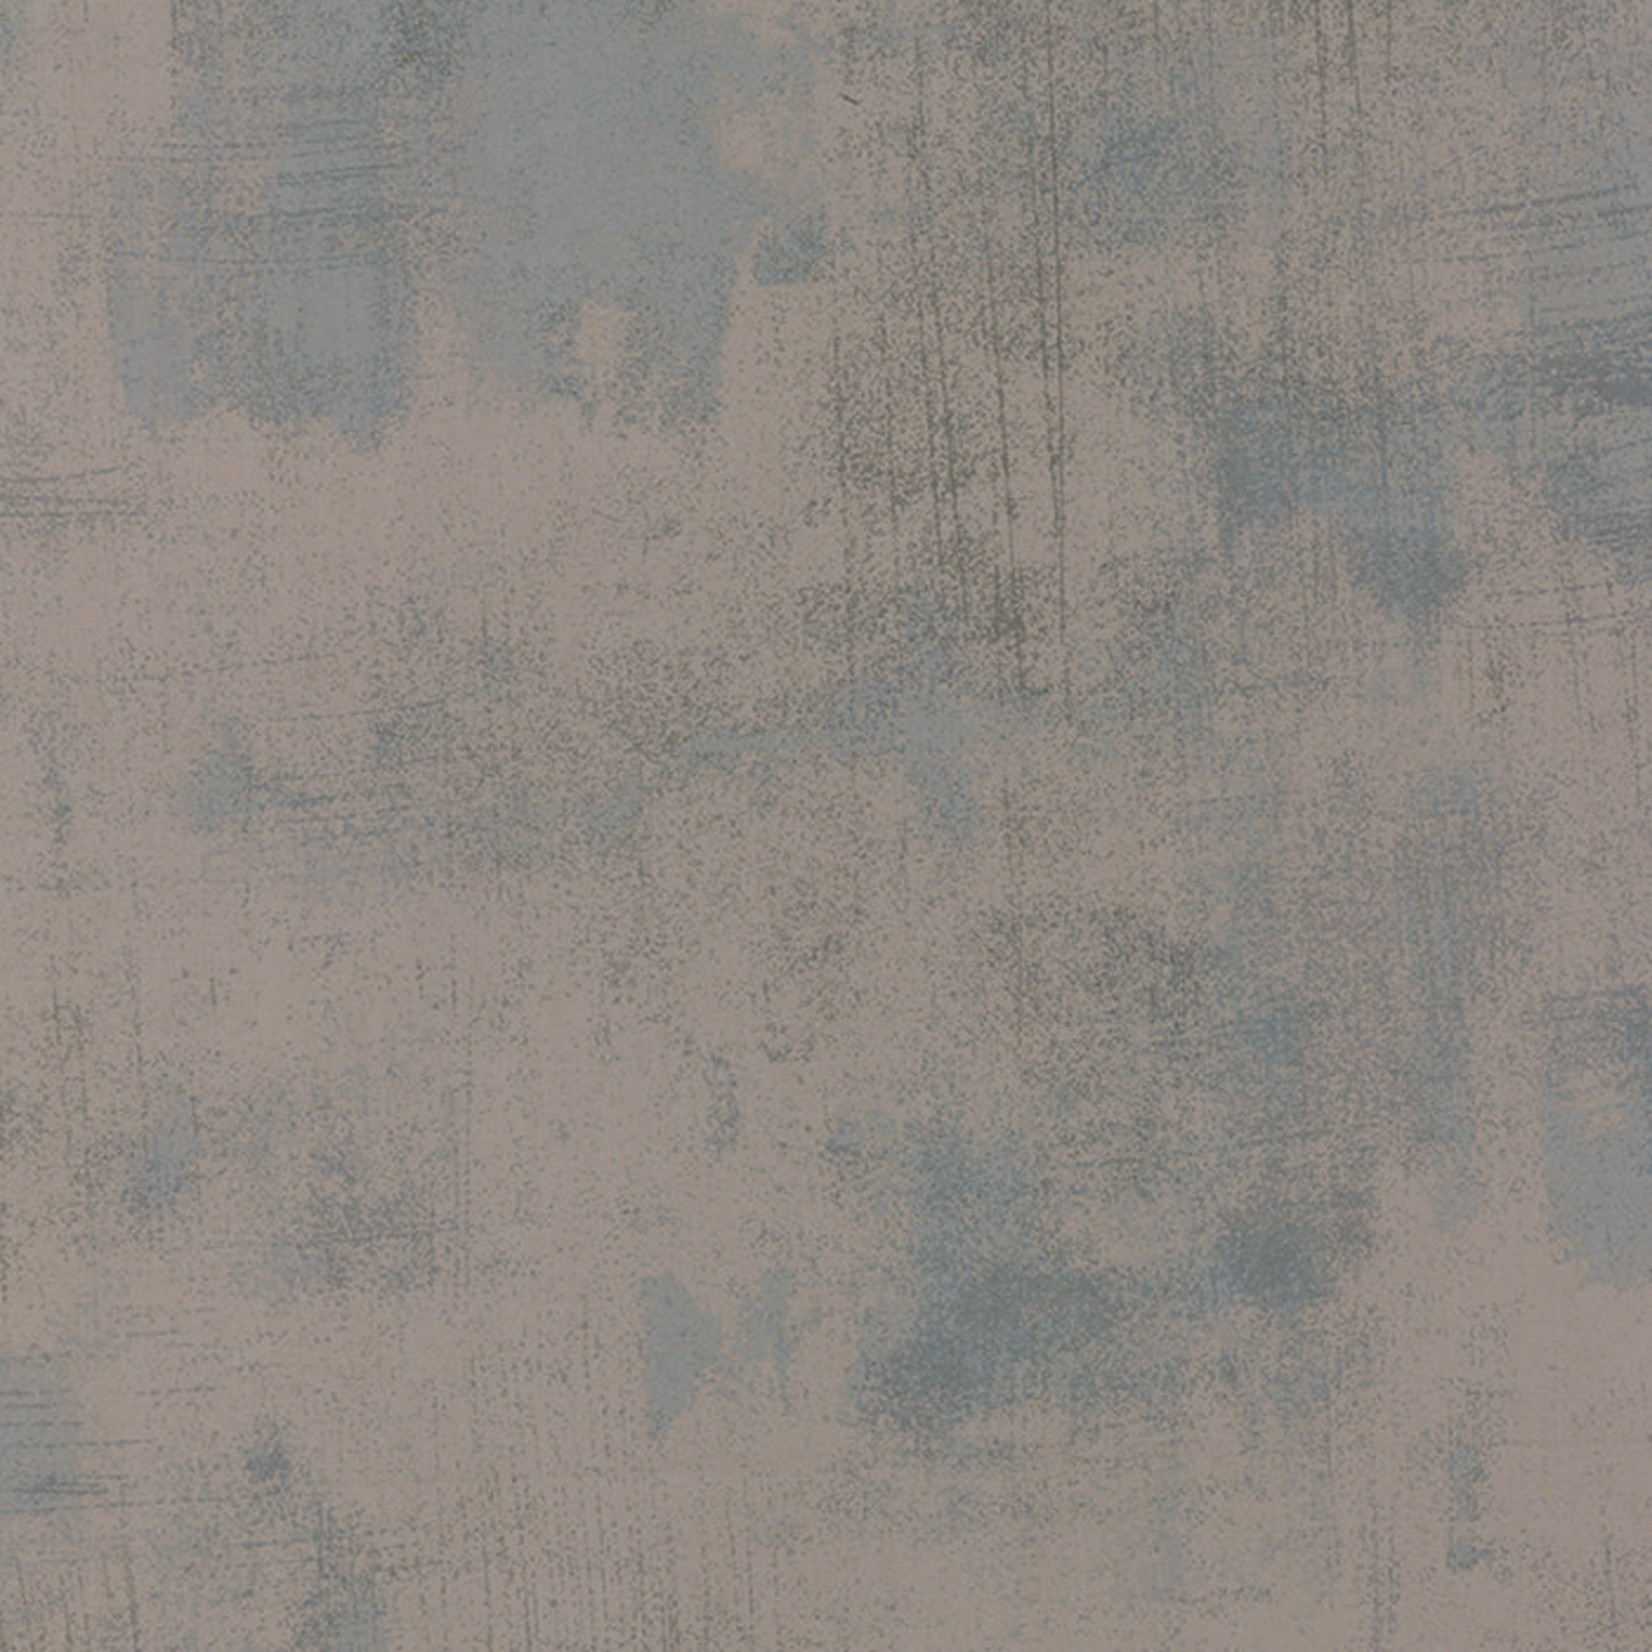 Moda Fabrics BasicGray - Grunge - Gray